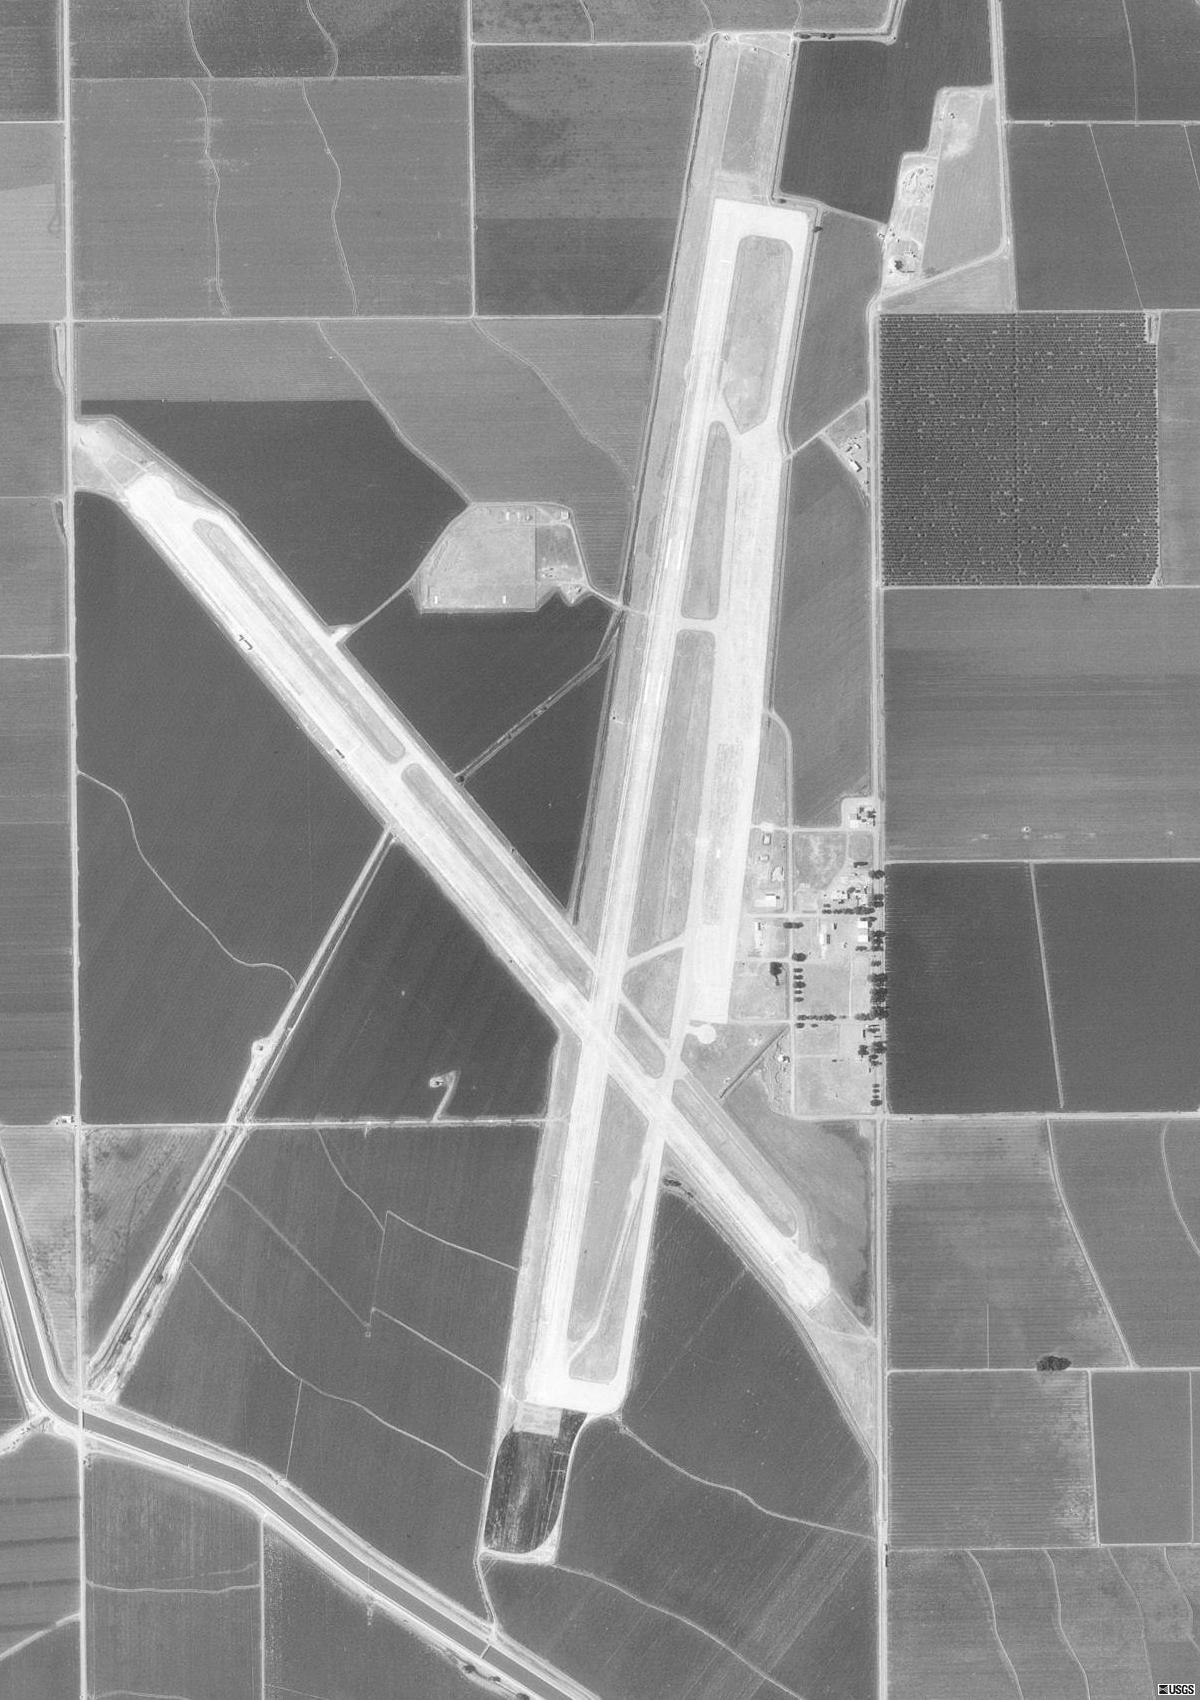 NASA Crows Landing Airport - Wikipedia